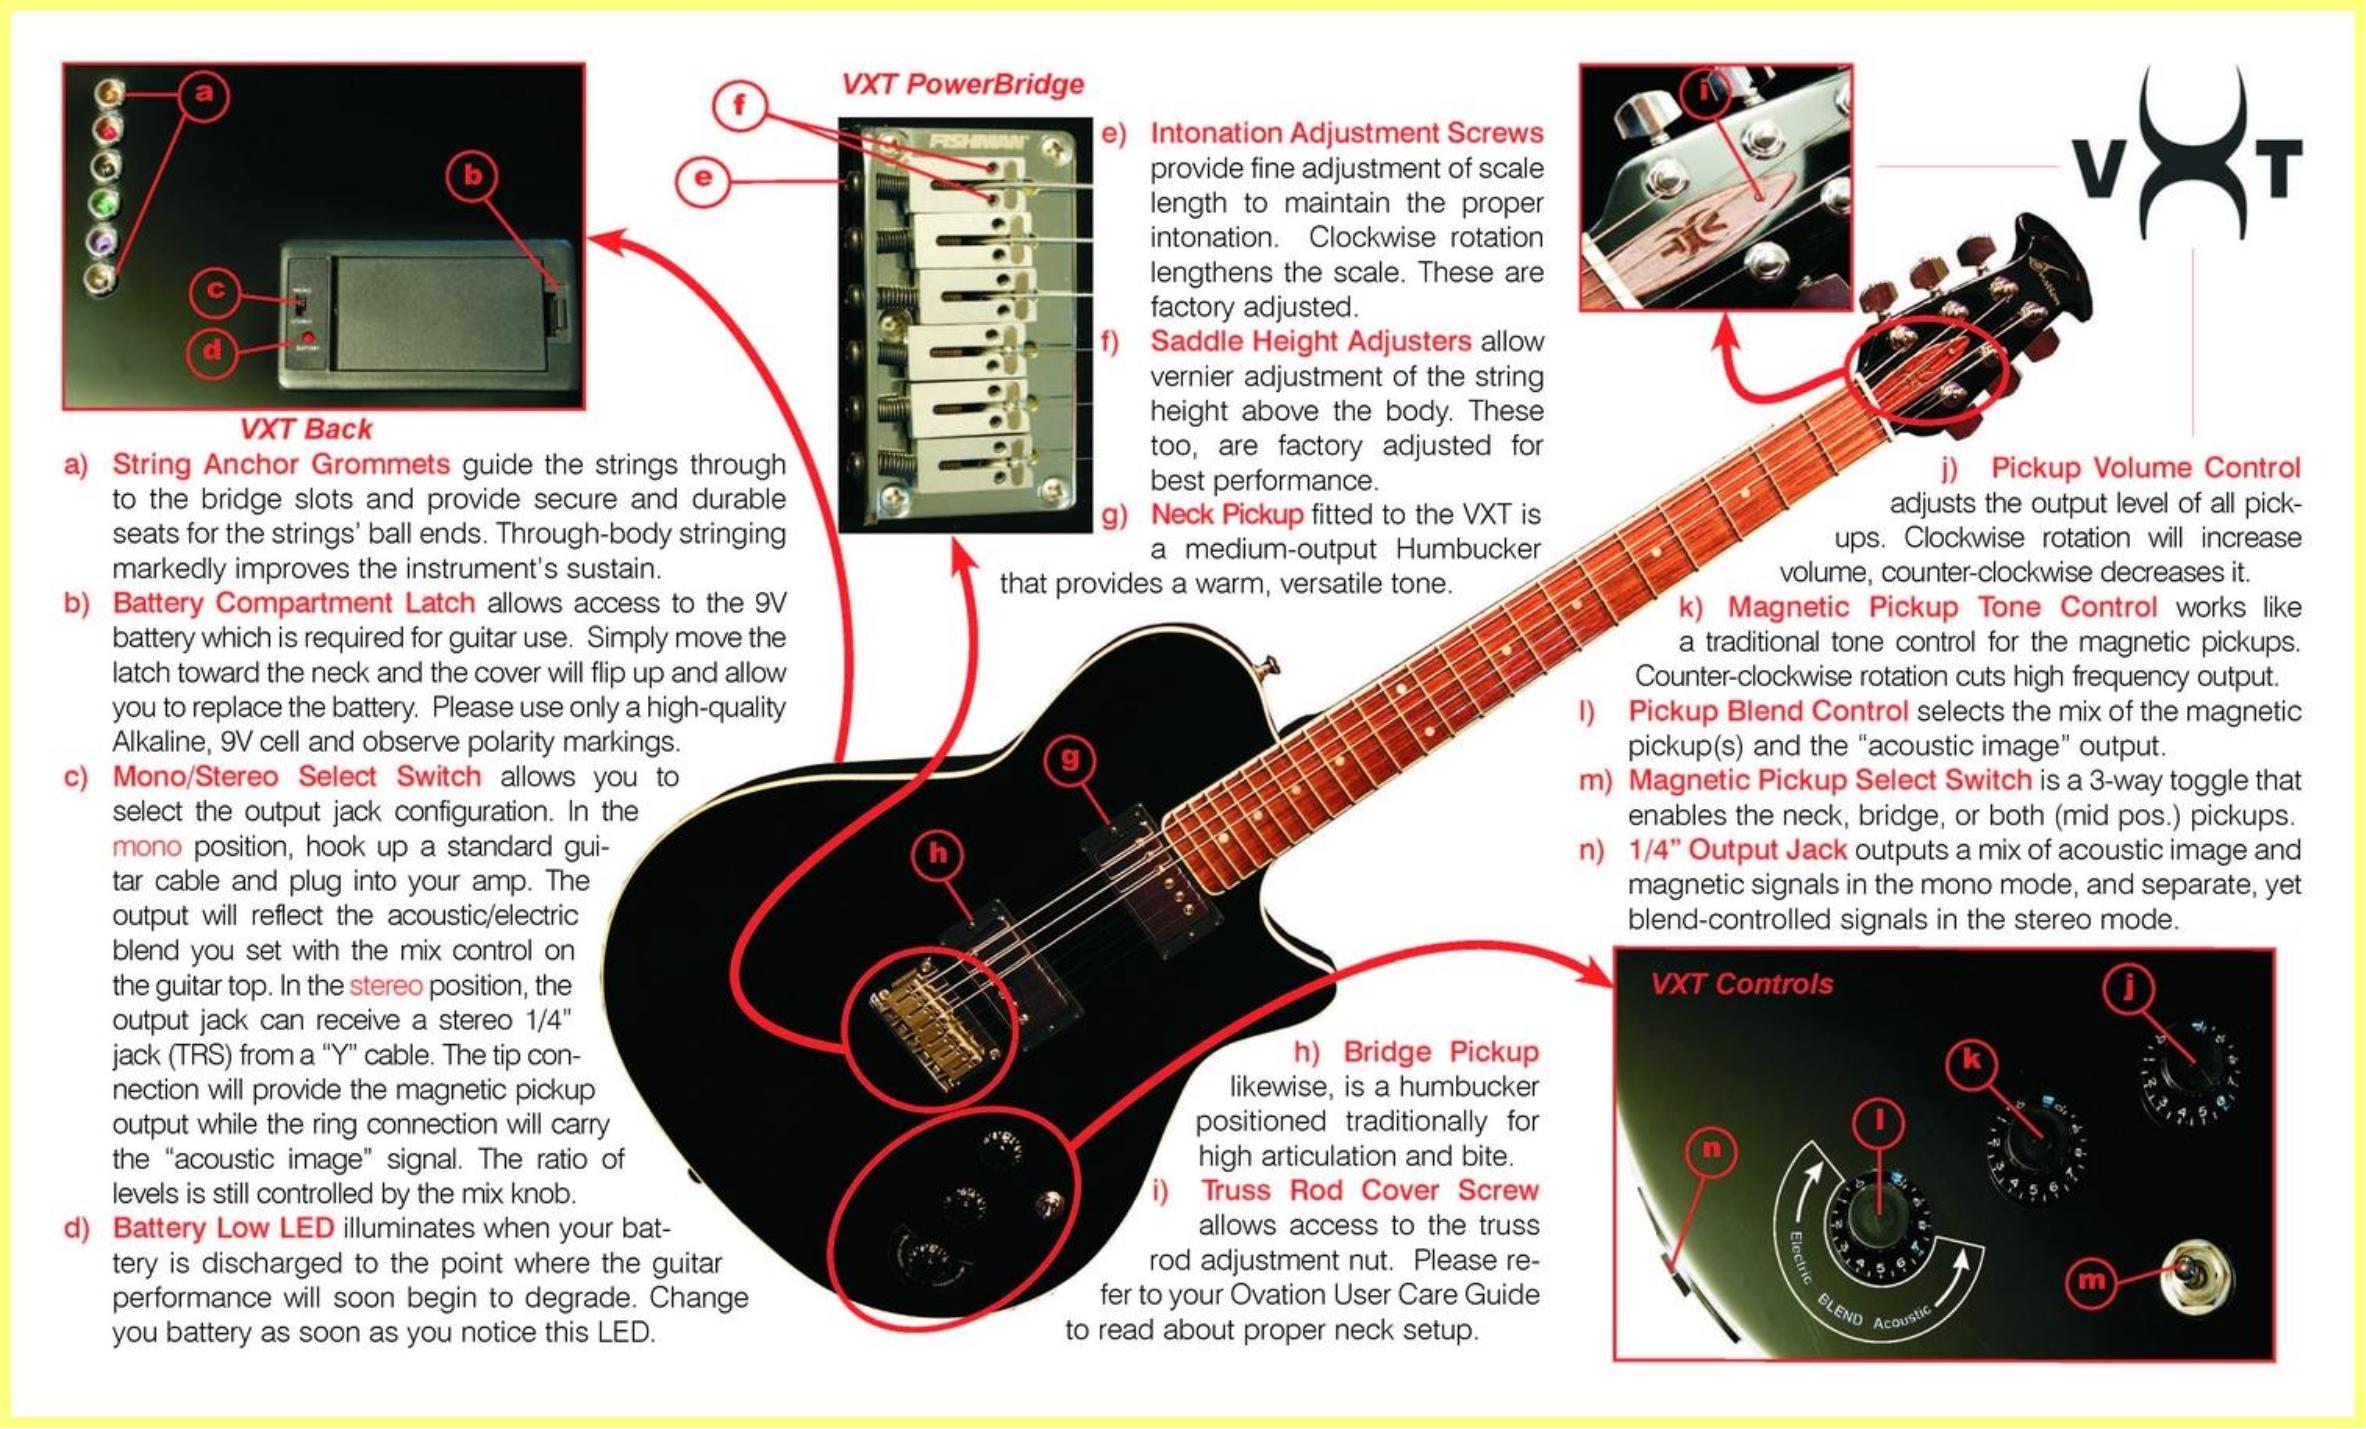 Download free pdf for Ovation VXT Standard Guitar manual